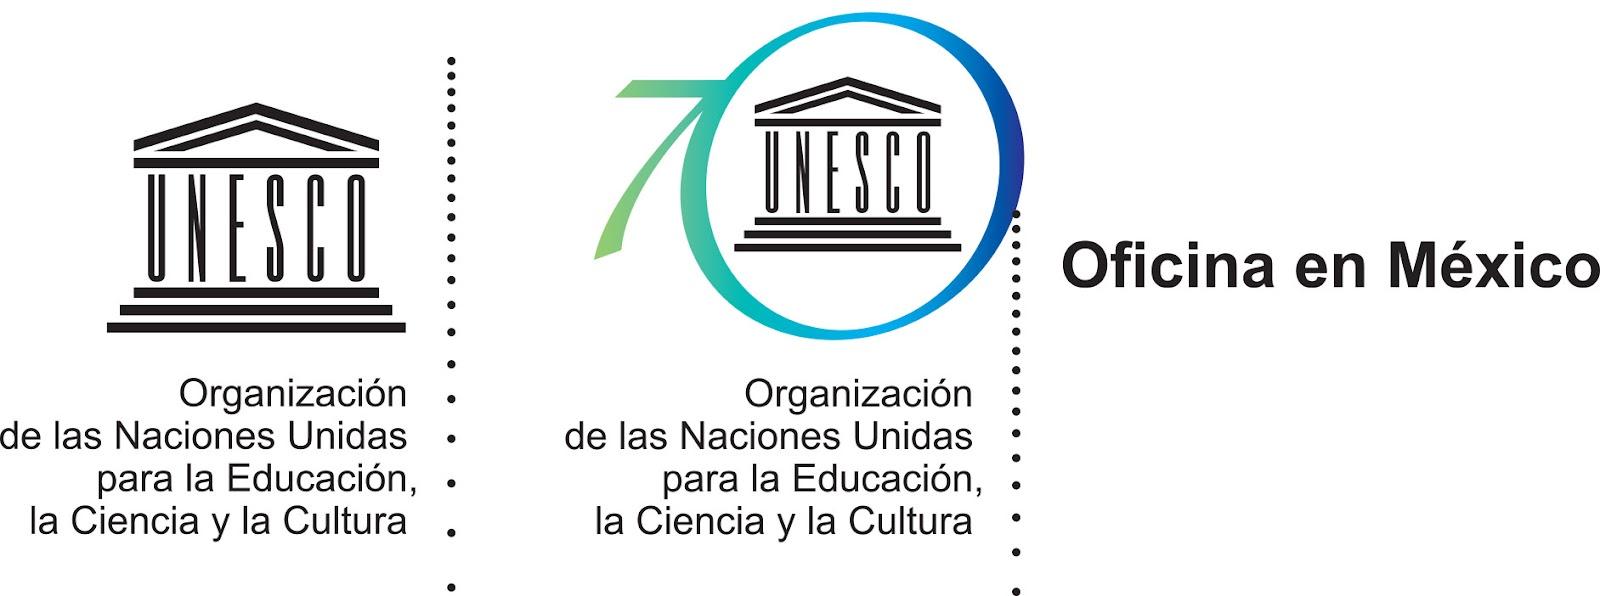 Logo Cultural UNESCO México 70 años